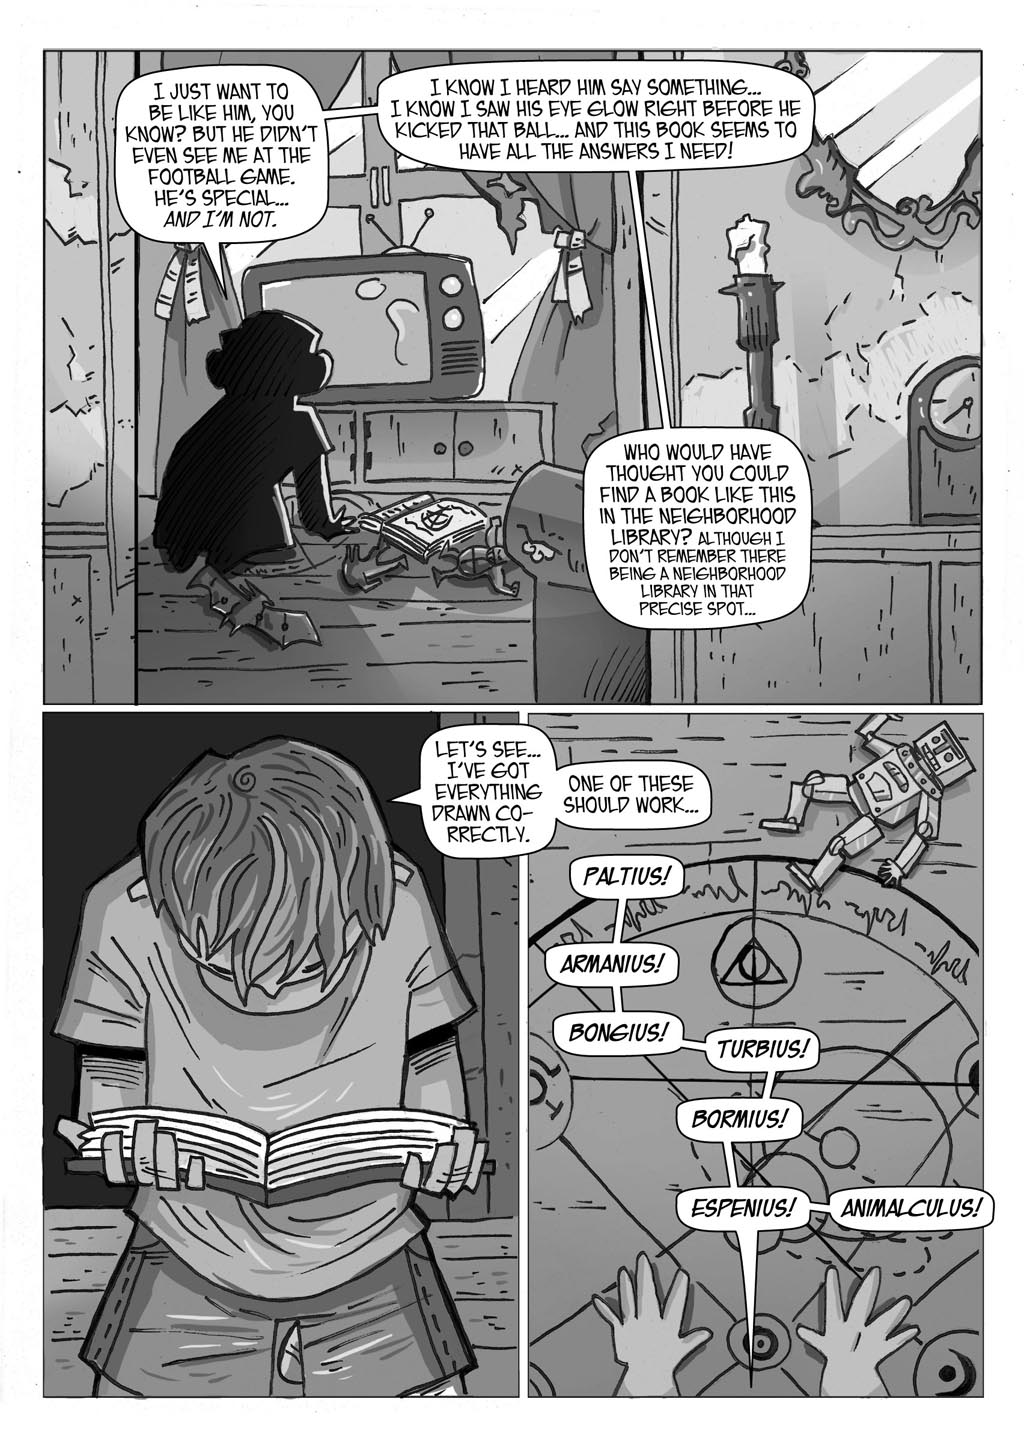 Portent - Page 27